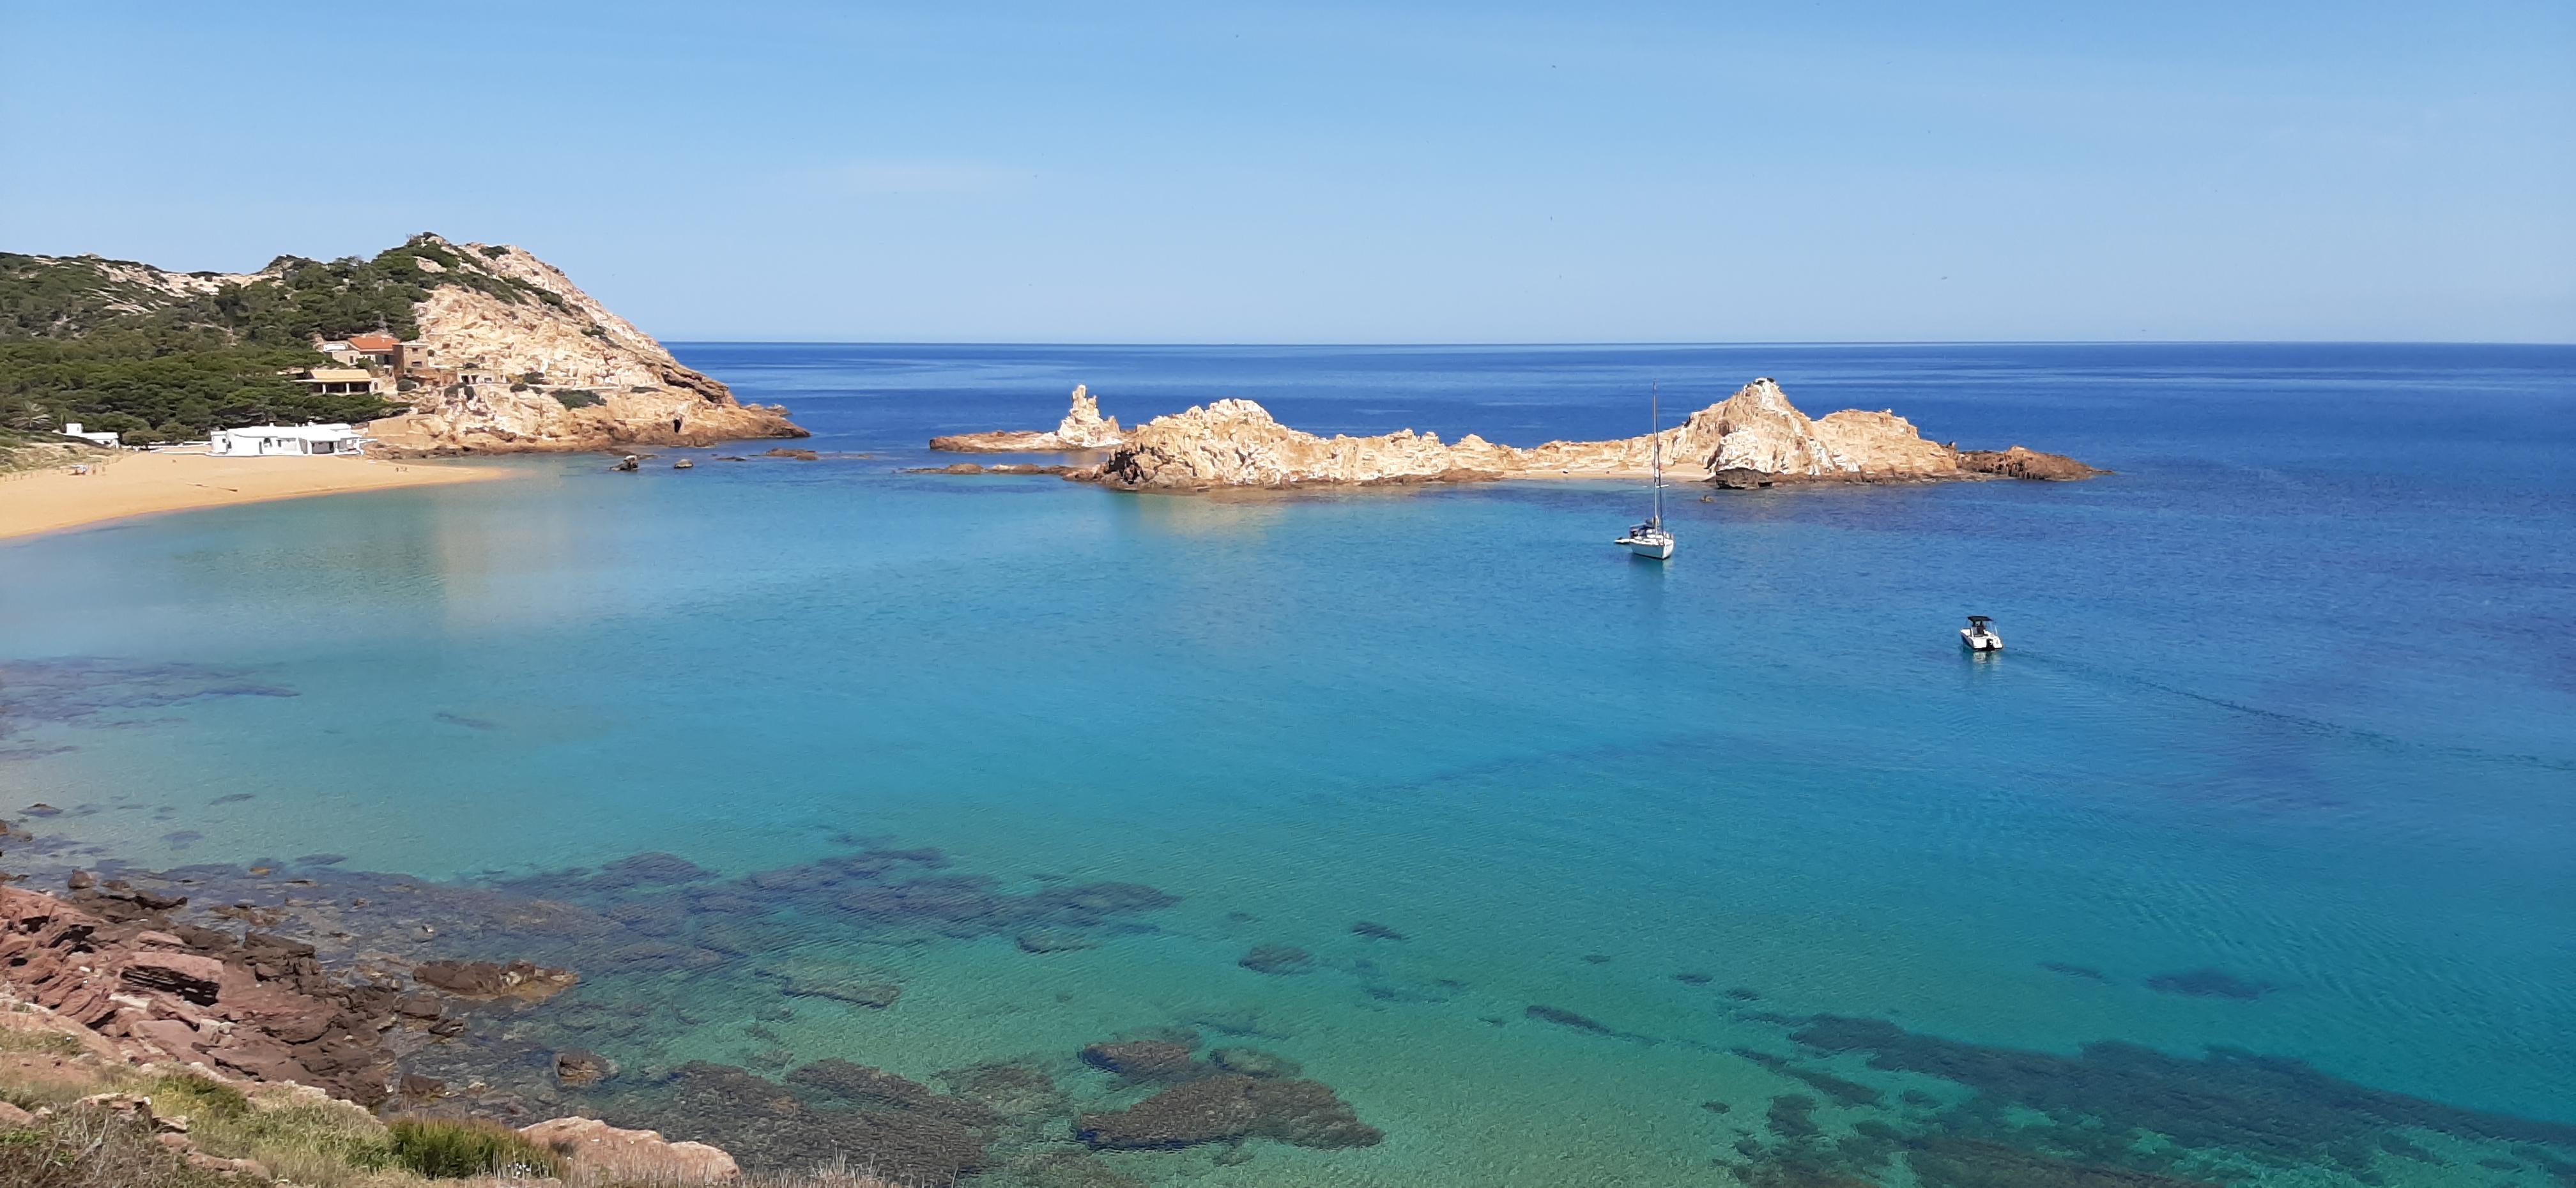 Cala Pregonda, Menorca, 6 mayo 2021